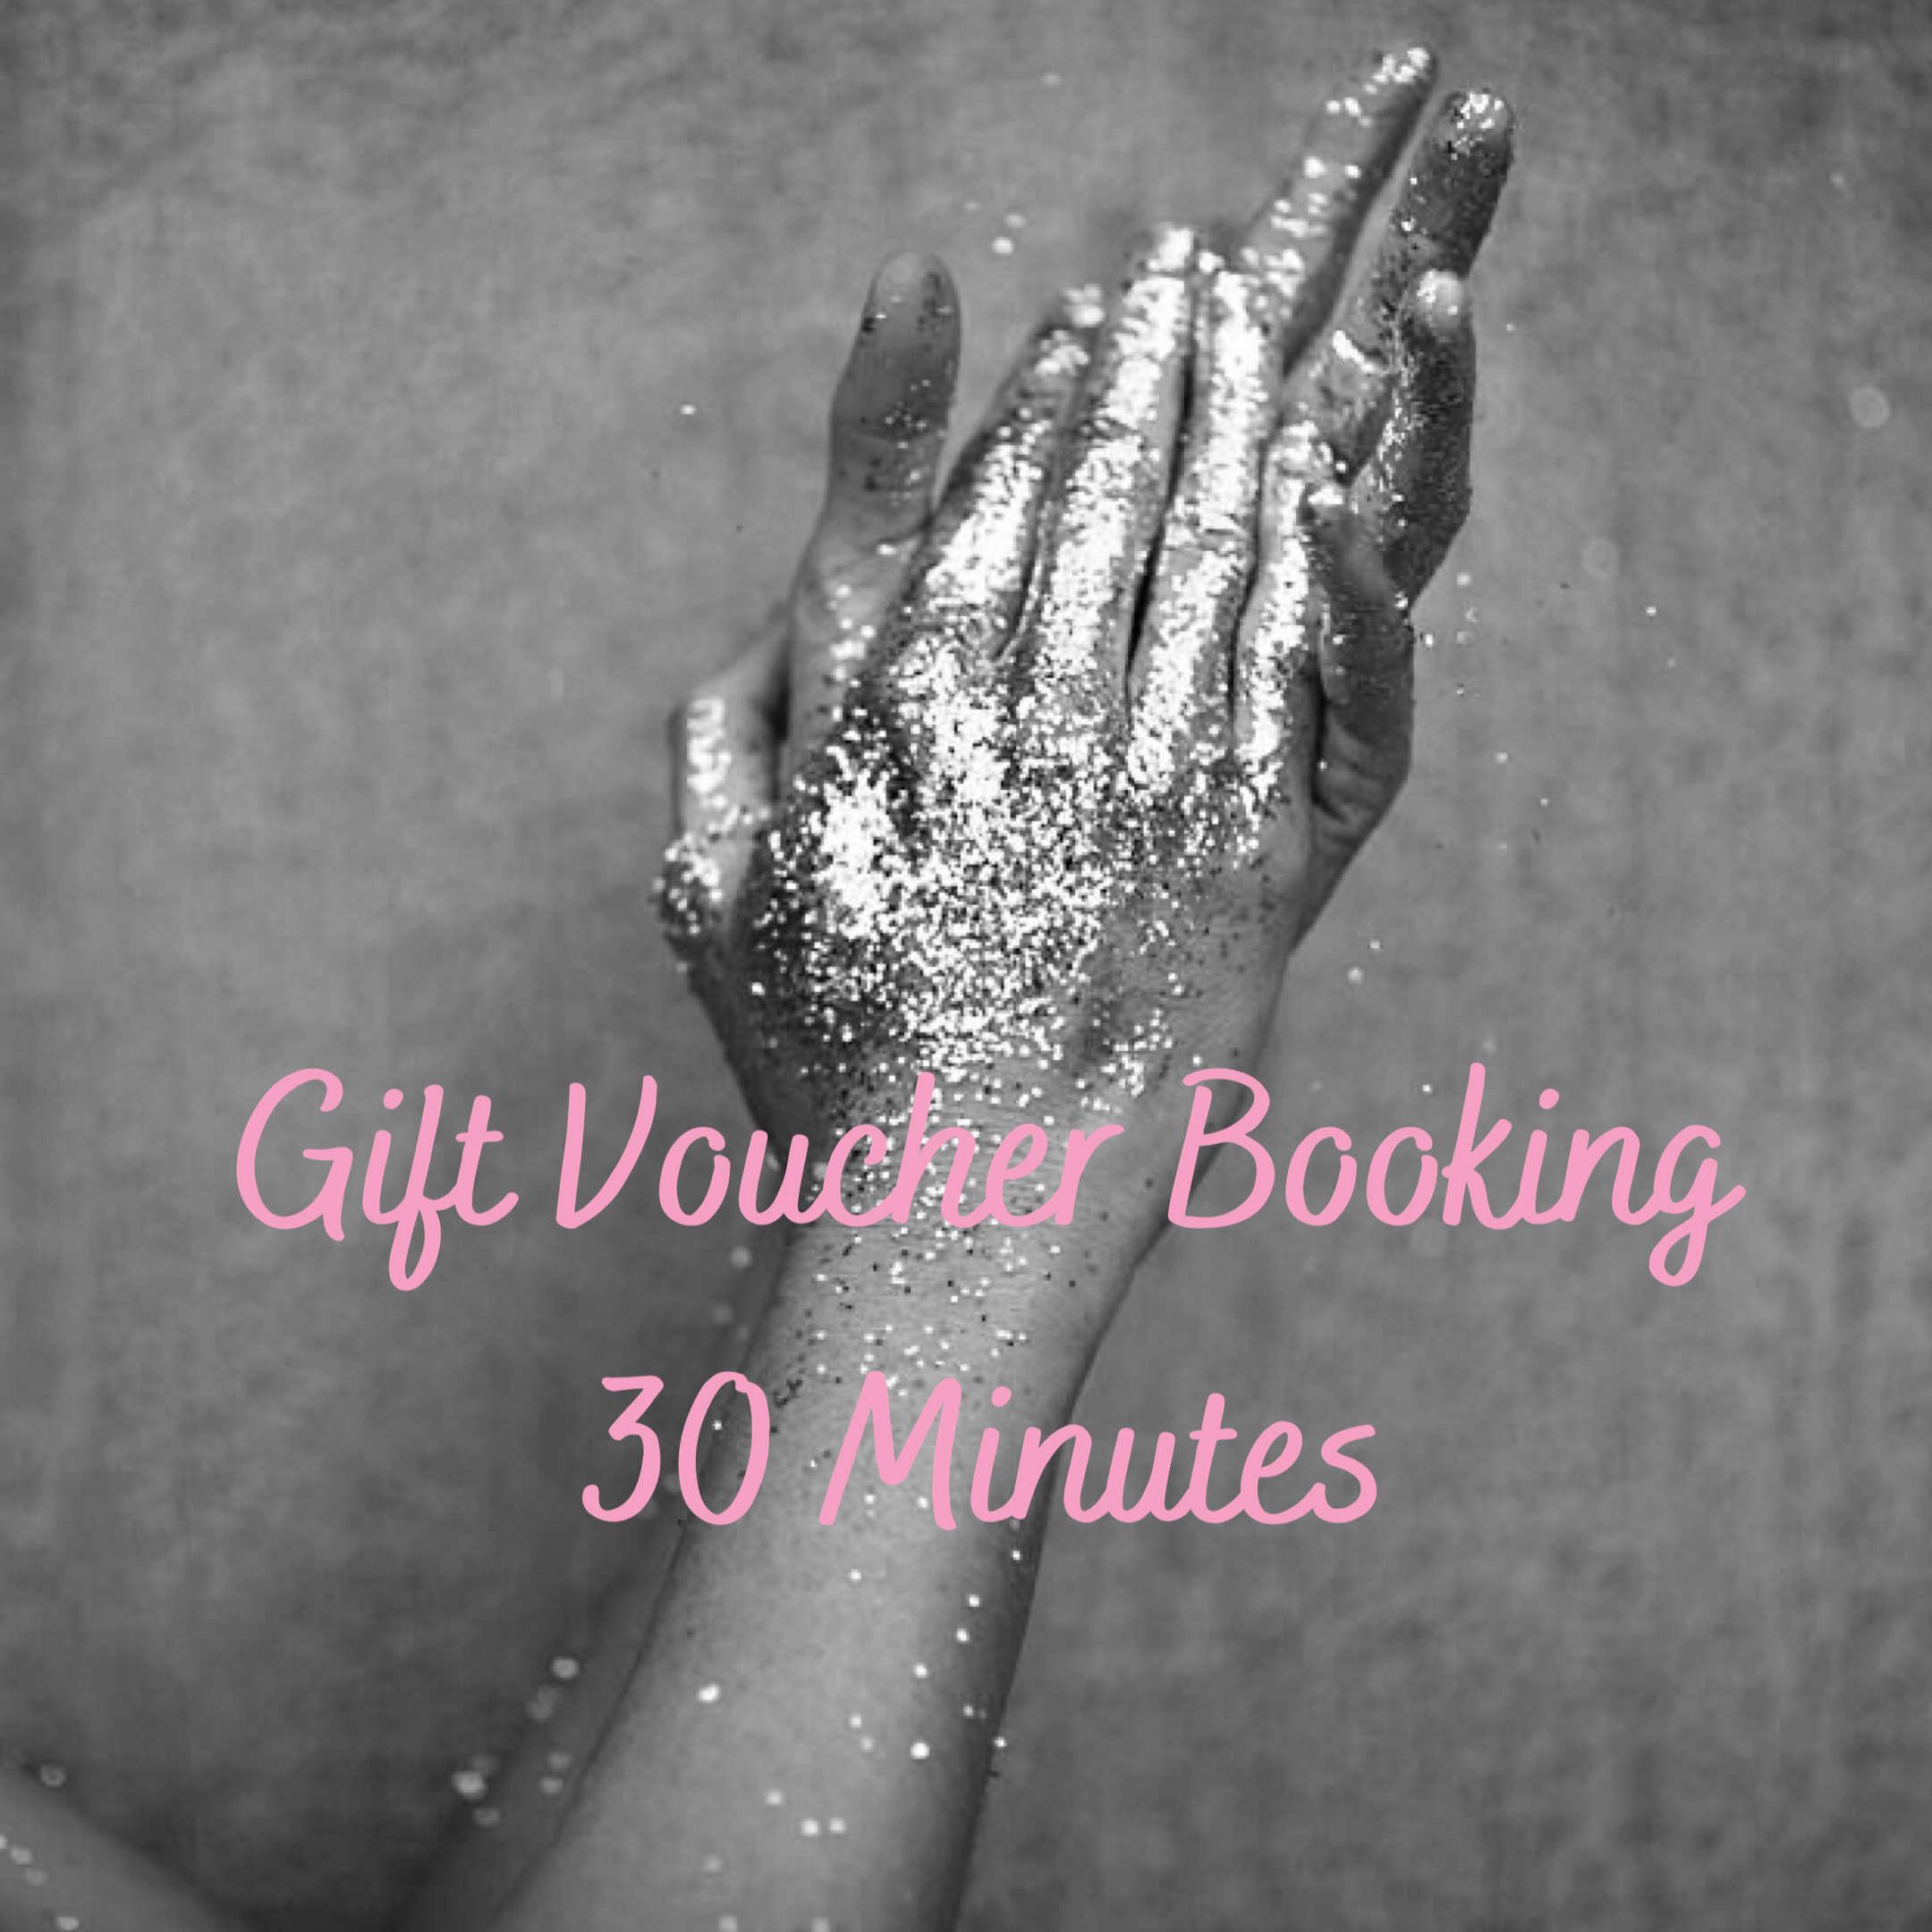 Gift Voucher Booking 30 Minutes